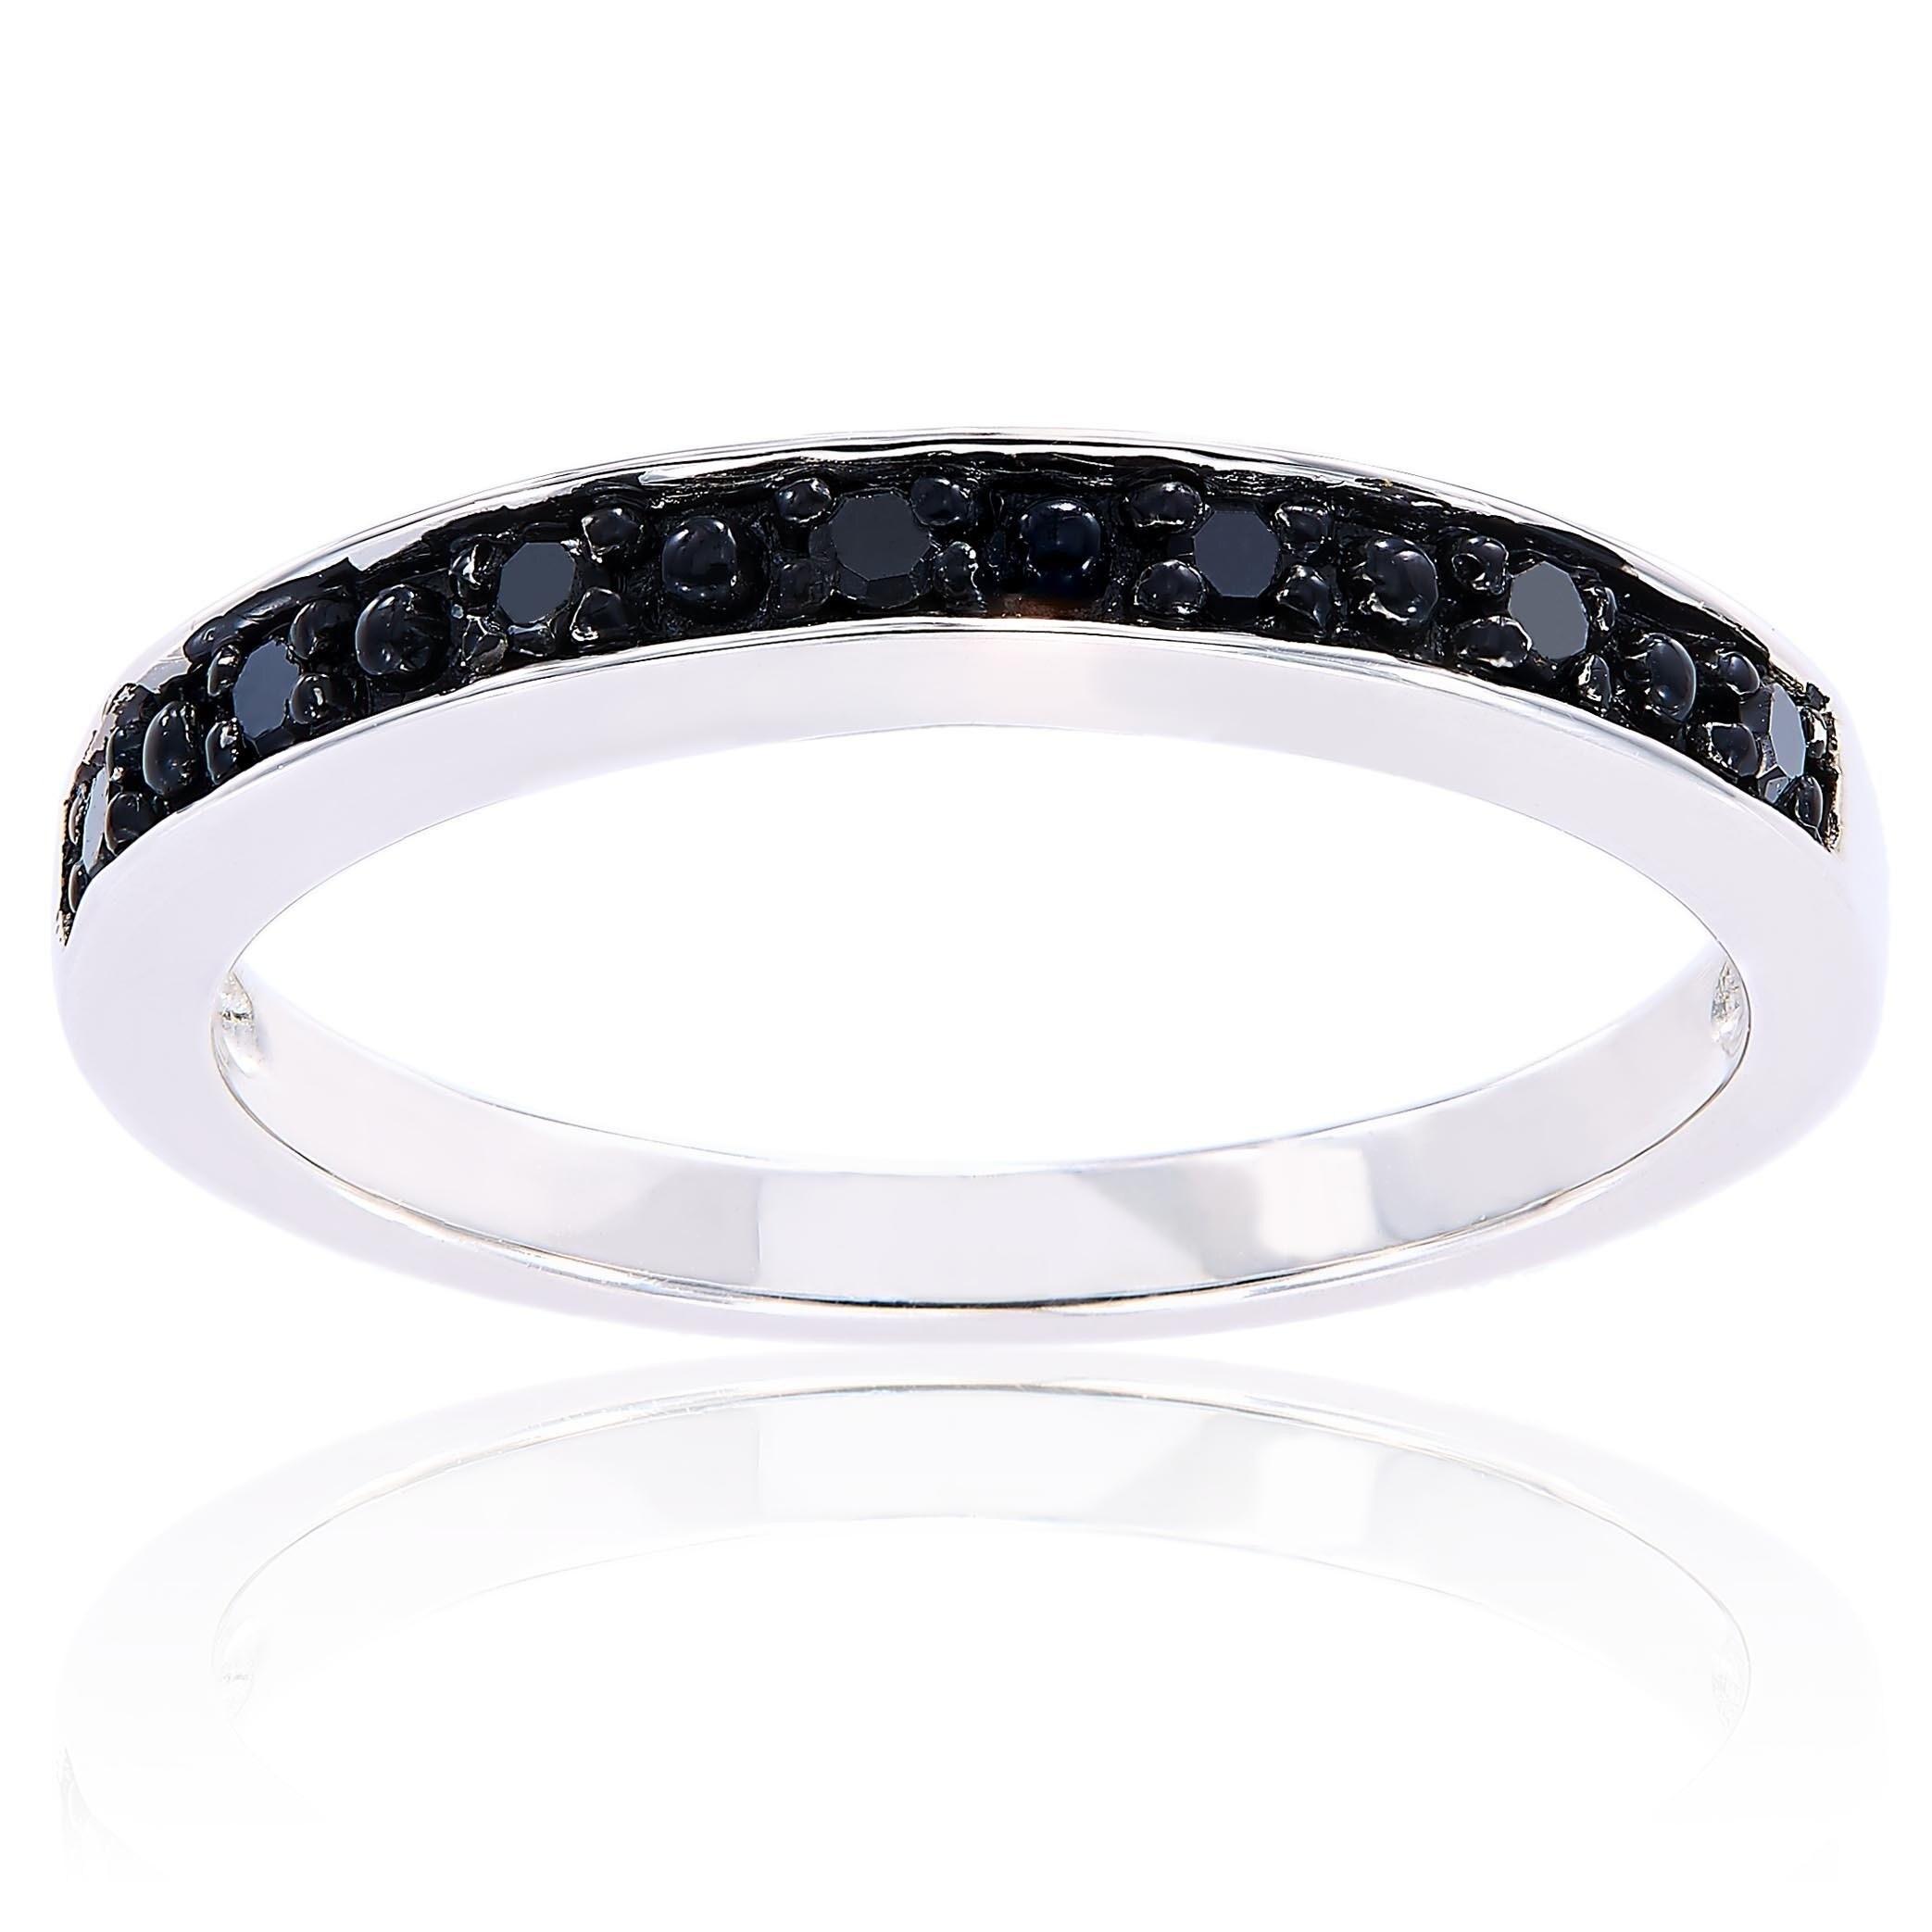 Shop Miadora Sterling Silver Black Diamond Stackable Anniversary